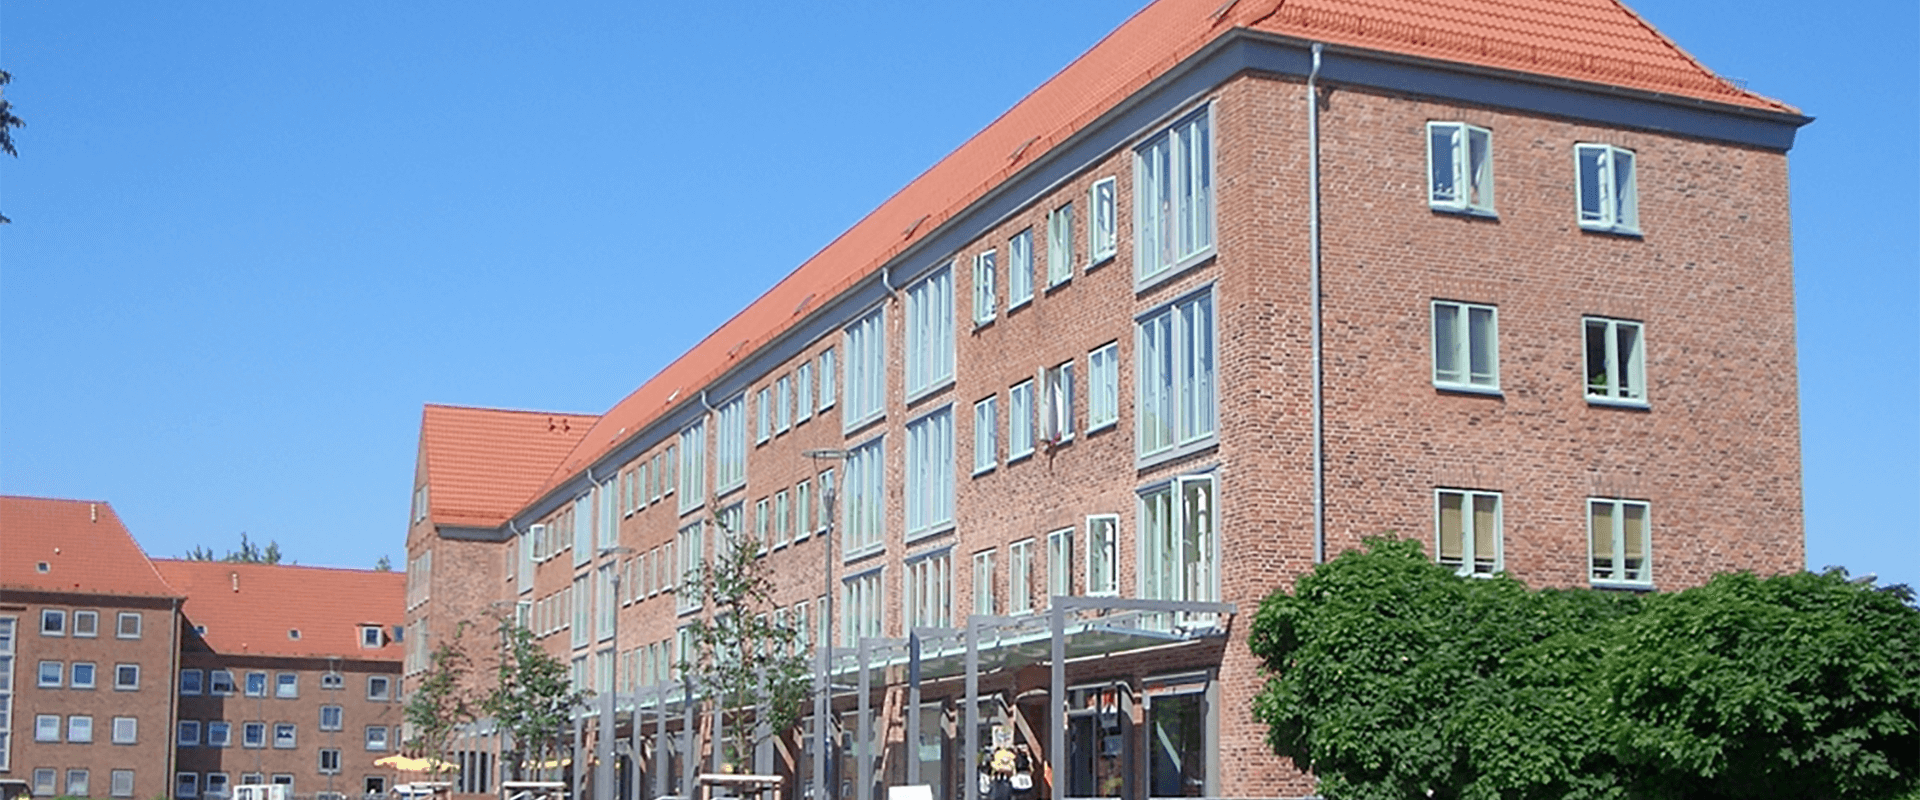 BSP-Architekten-Kiel-Kantplatz-Nord